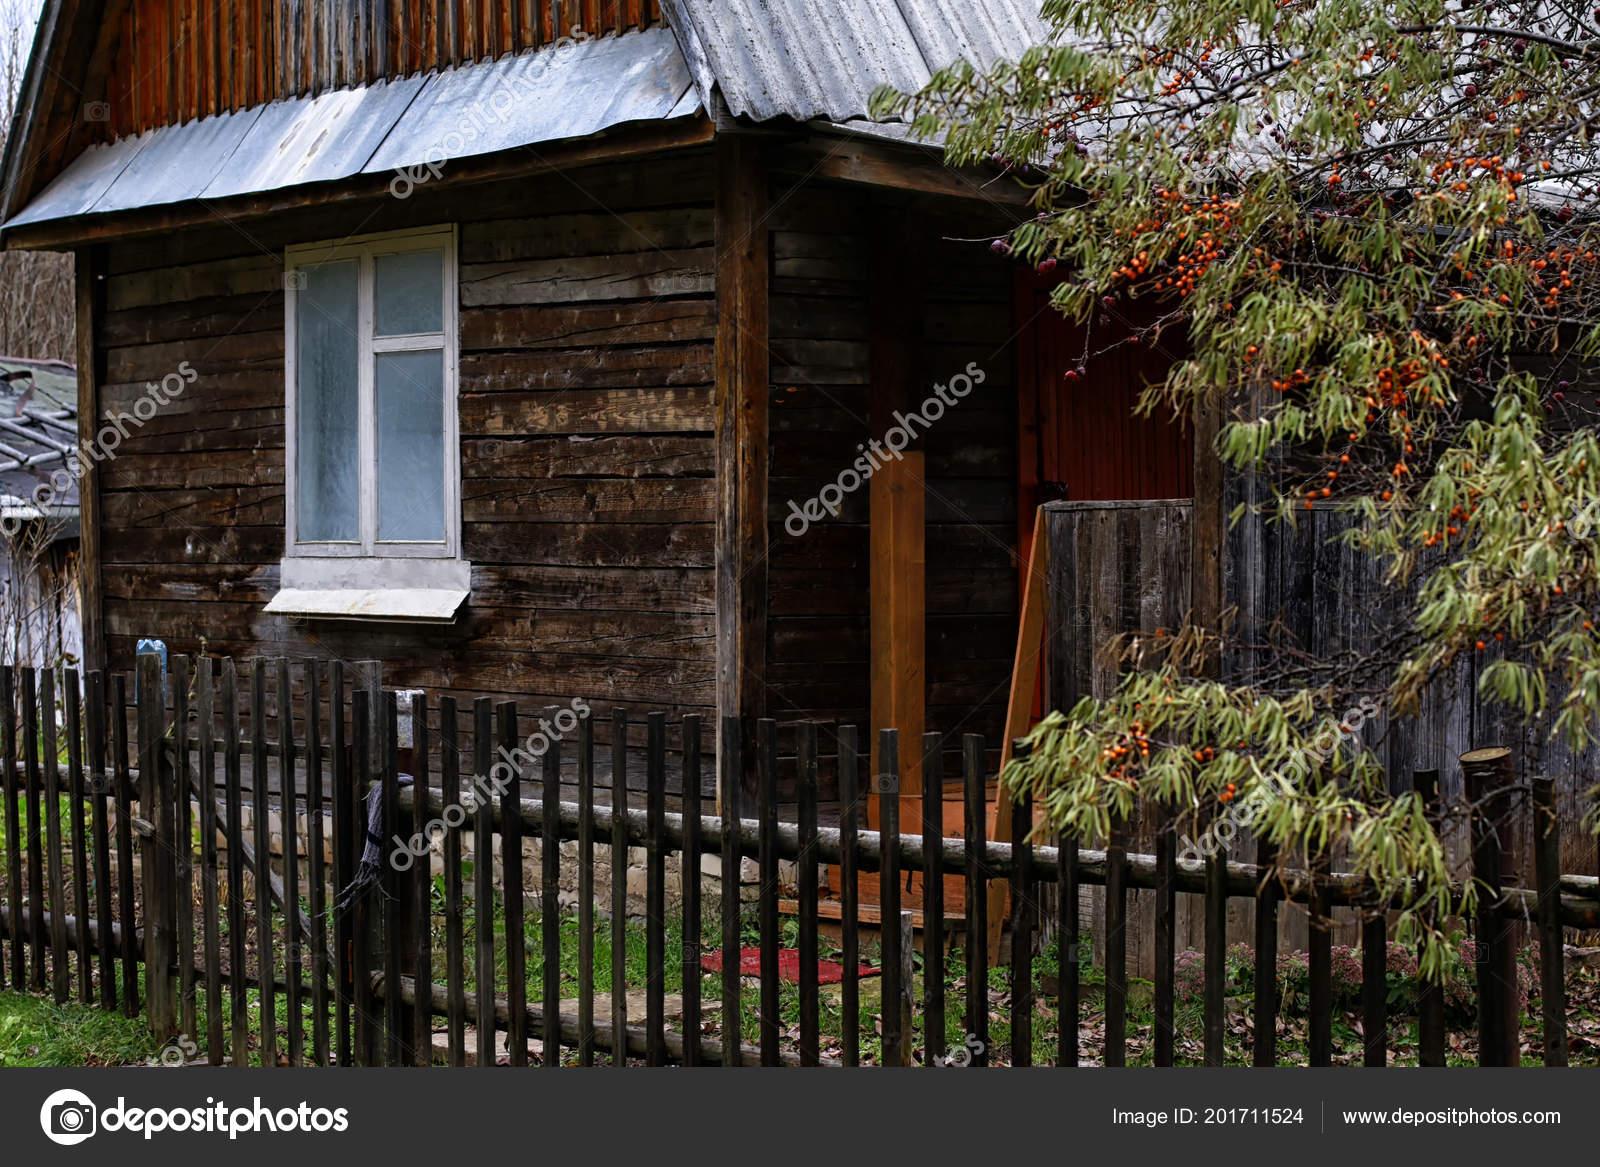 7f5f193aeb91 Ρωσικό Χωριό Και Ξύλινο Σπίτι Μέσα Μια Μέρα — Φωτογραφία Αρχείου ...